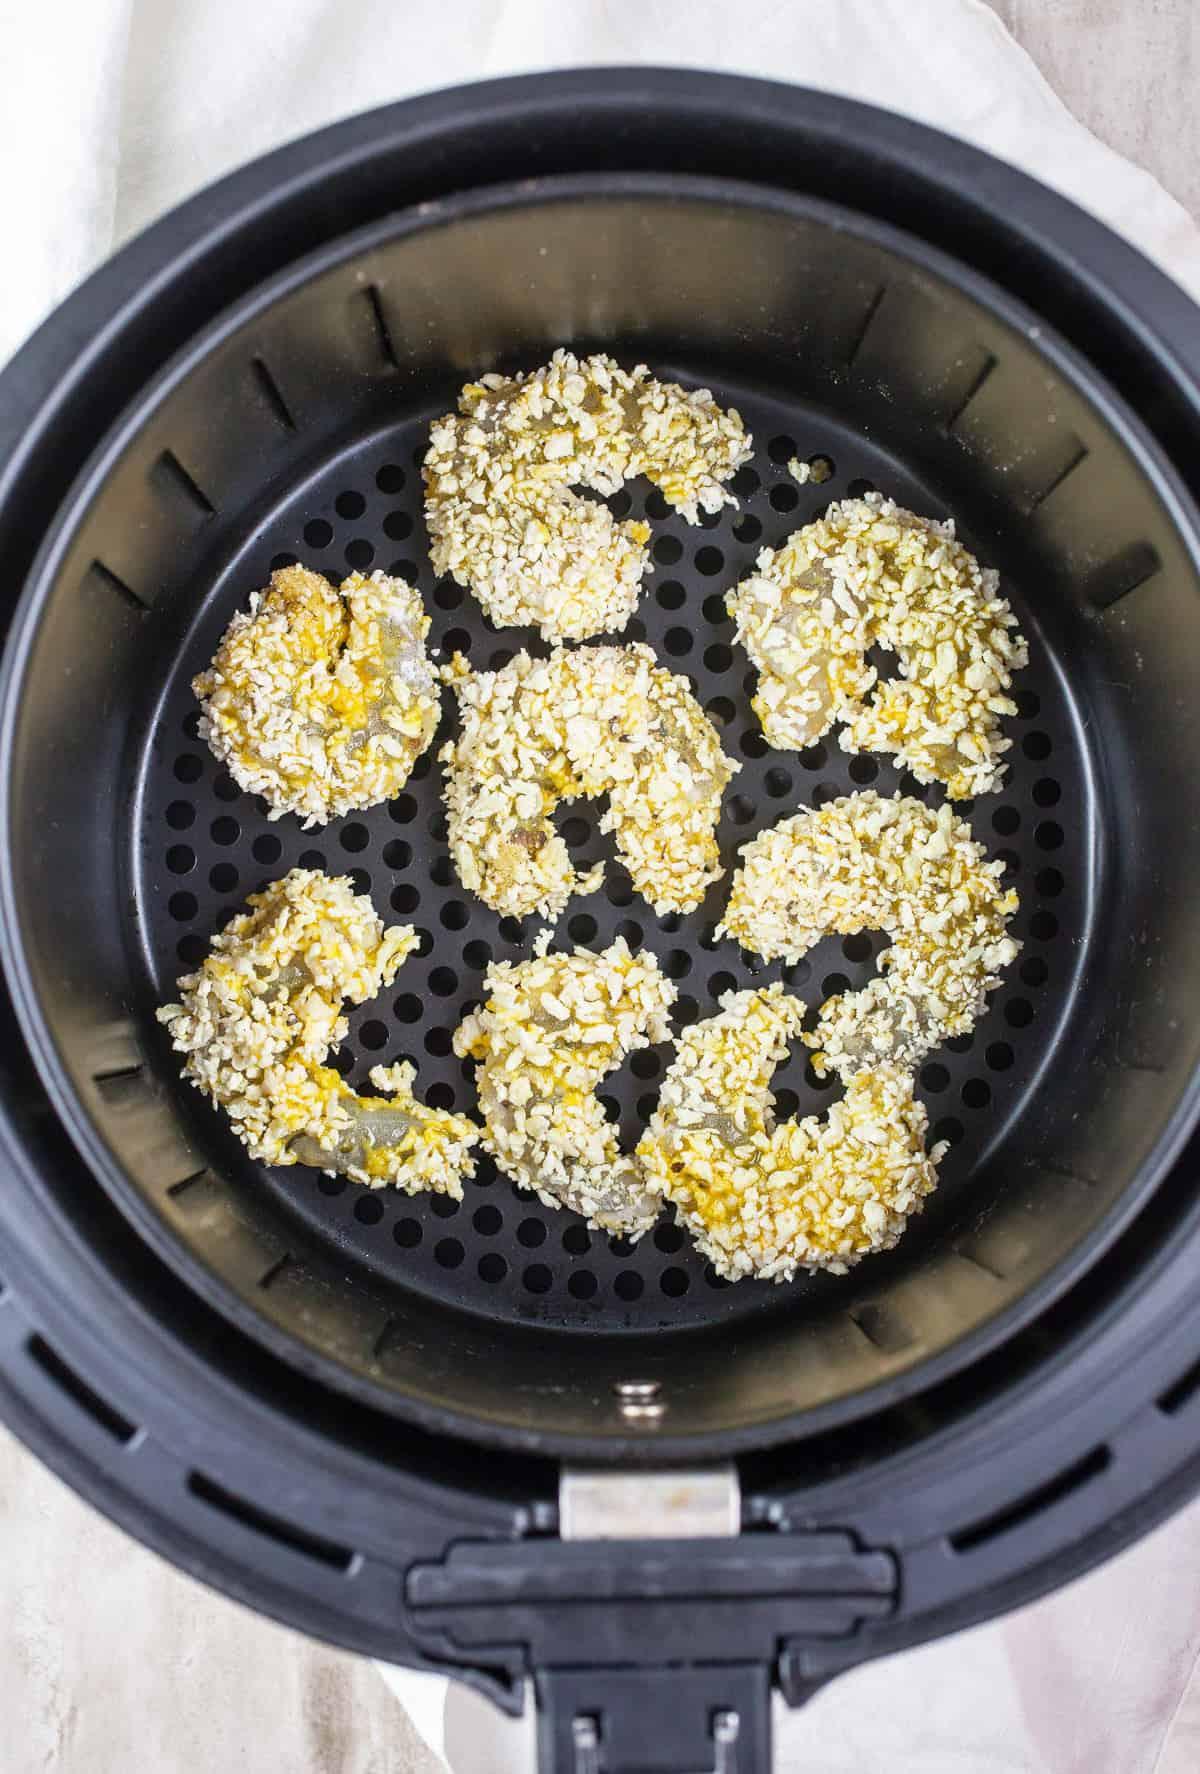 Air Fryer Fried Shrimp in Air Fryer Basket